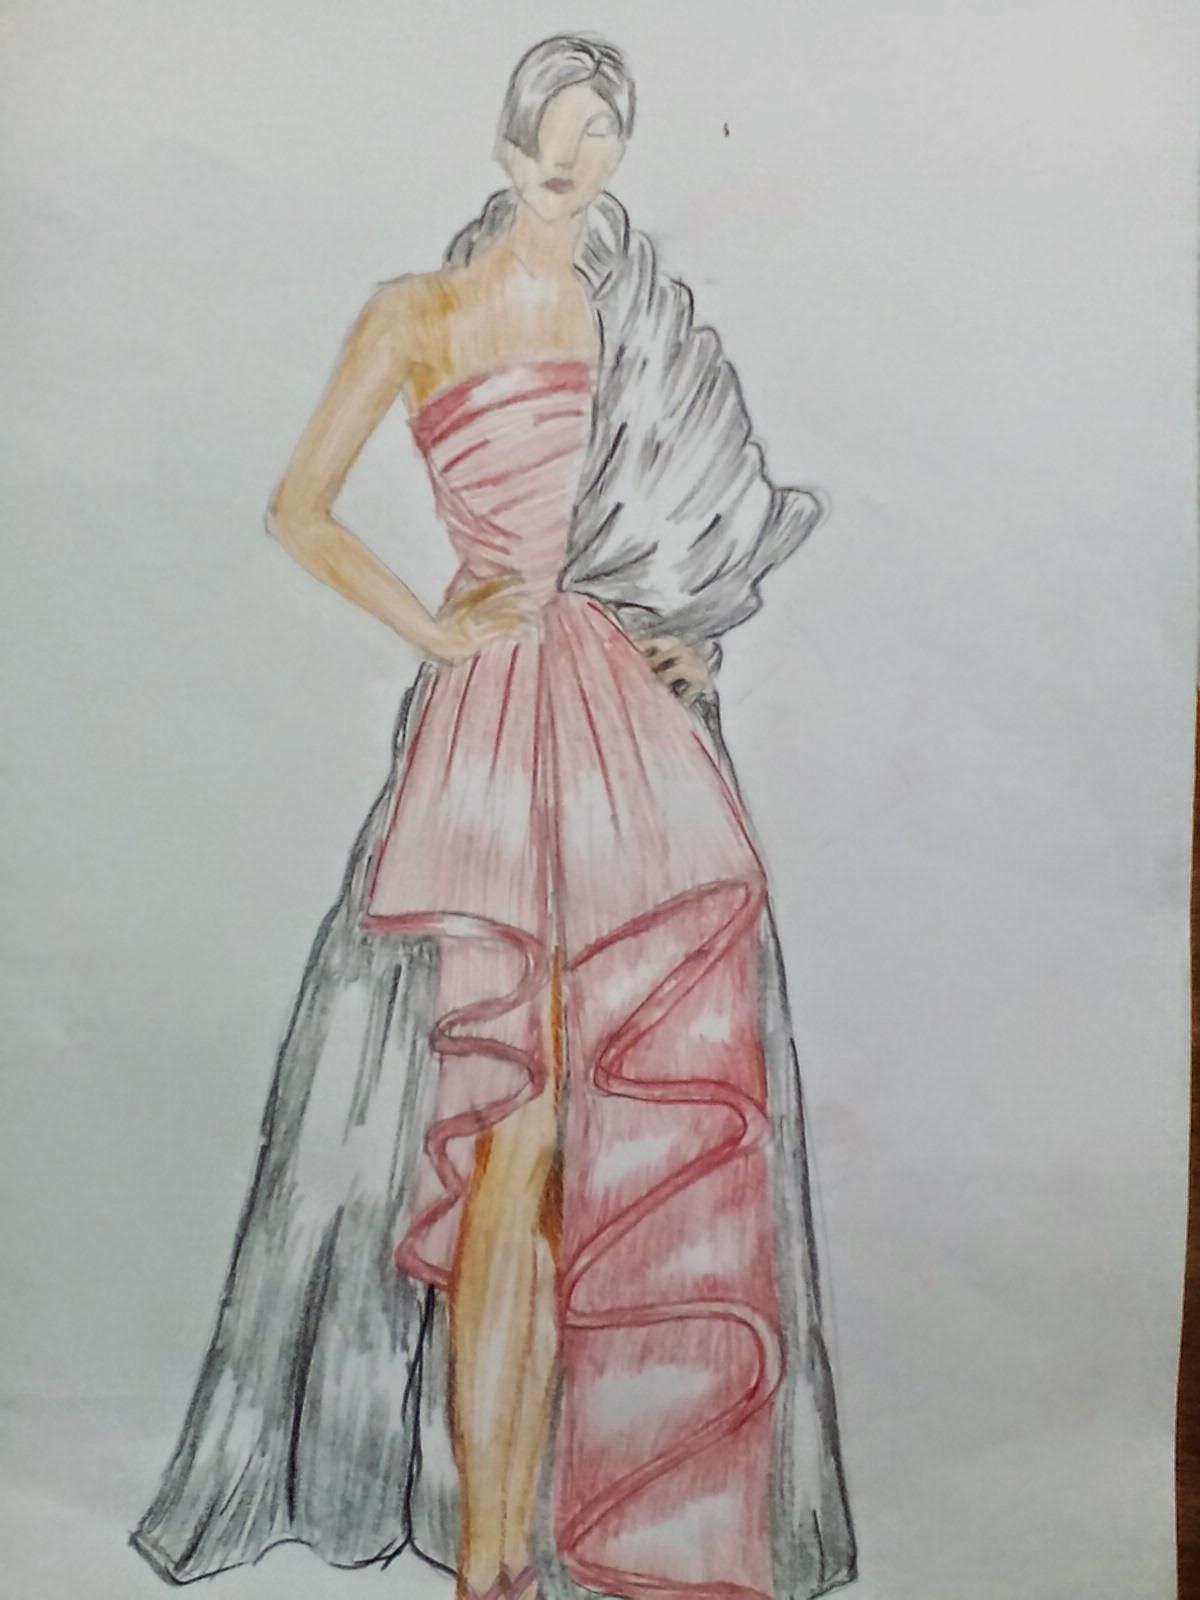 68 Gambar Sketsa Baju Gaun Terlengkap Duniasket